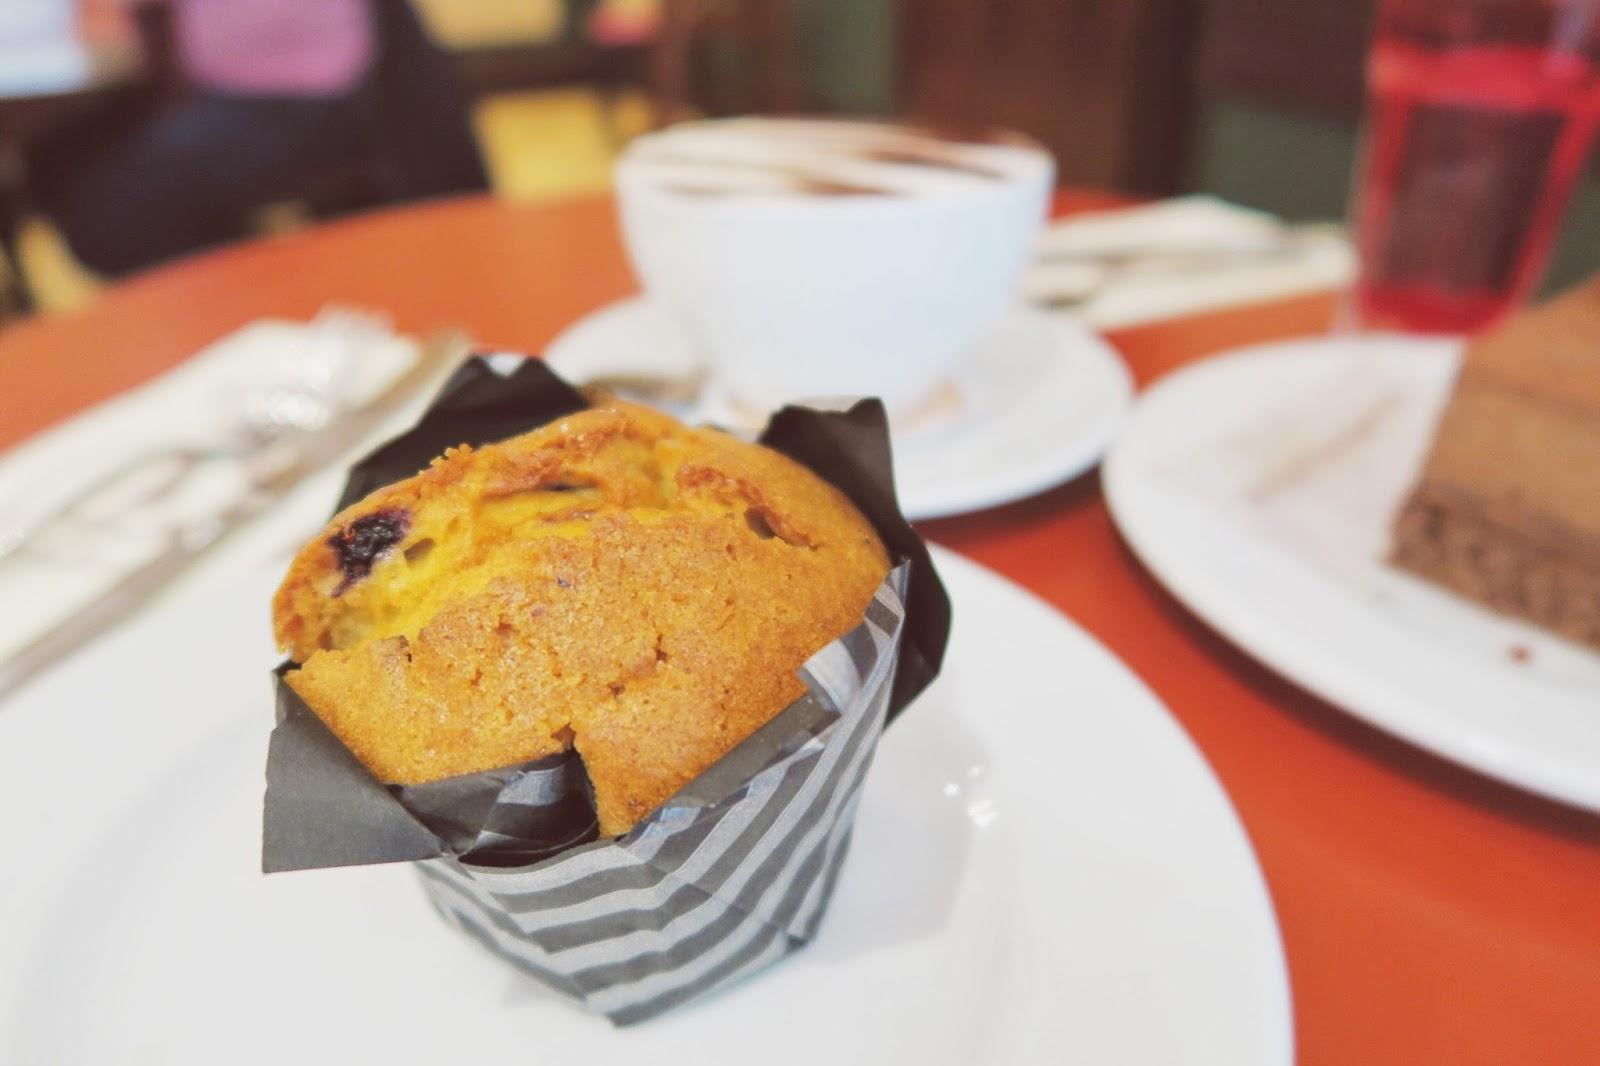 Patisserie Valerie, Katie Writes Blog, Cake, Baking,